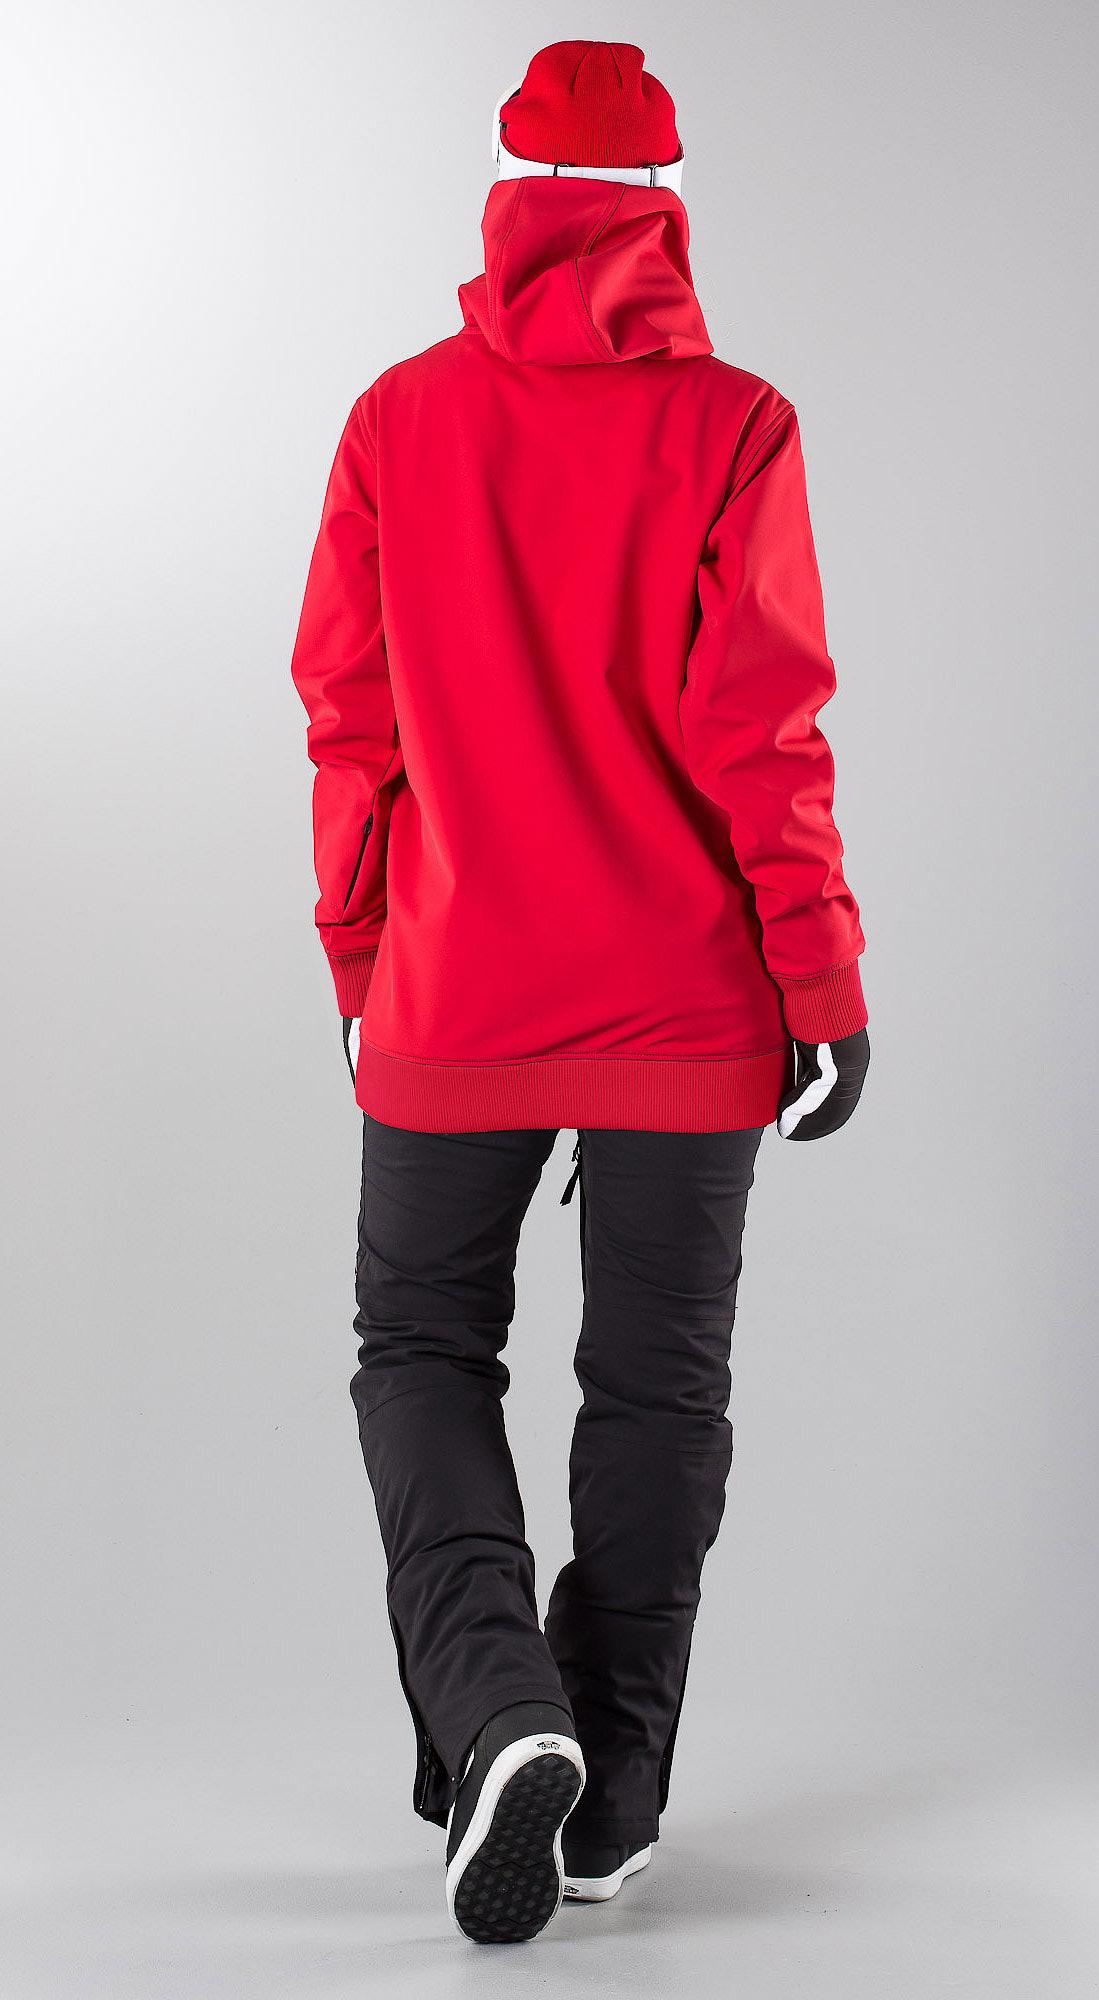 a4908b14 Dope Yeti Red Snowboardklaer - Ridestore